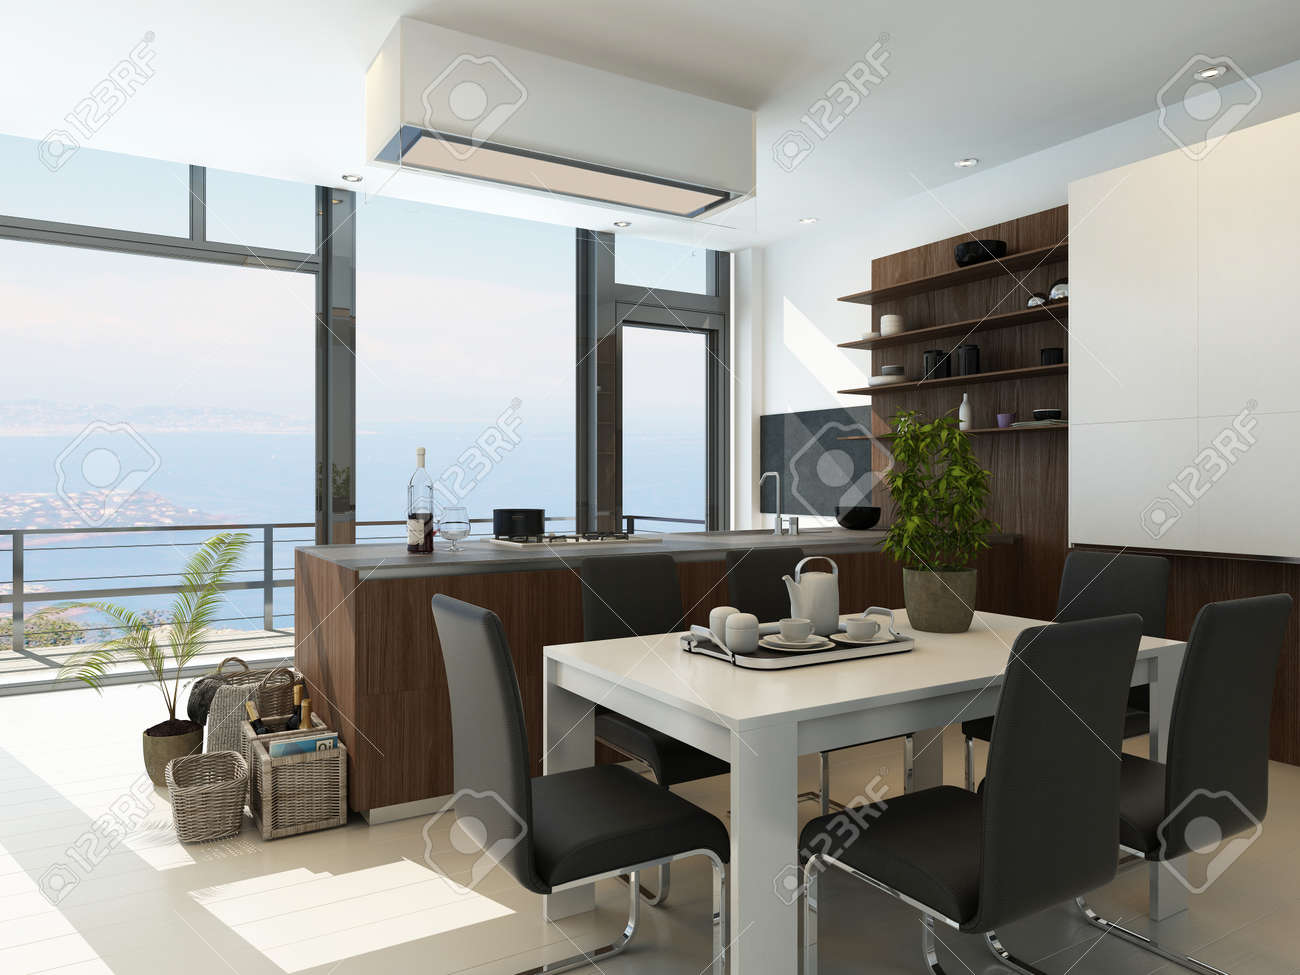 Modern white kitchen interior with landscape view Stock Photo - 25065169